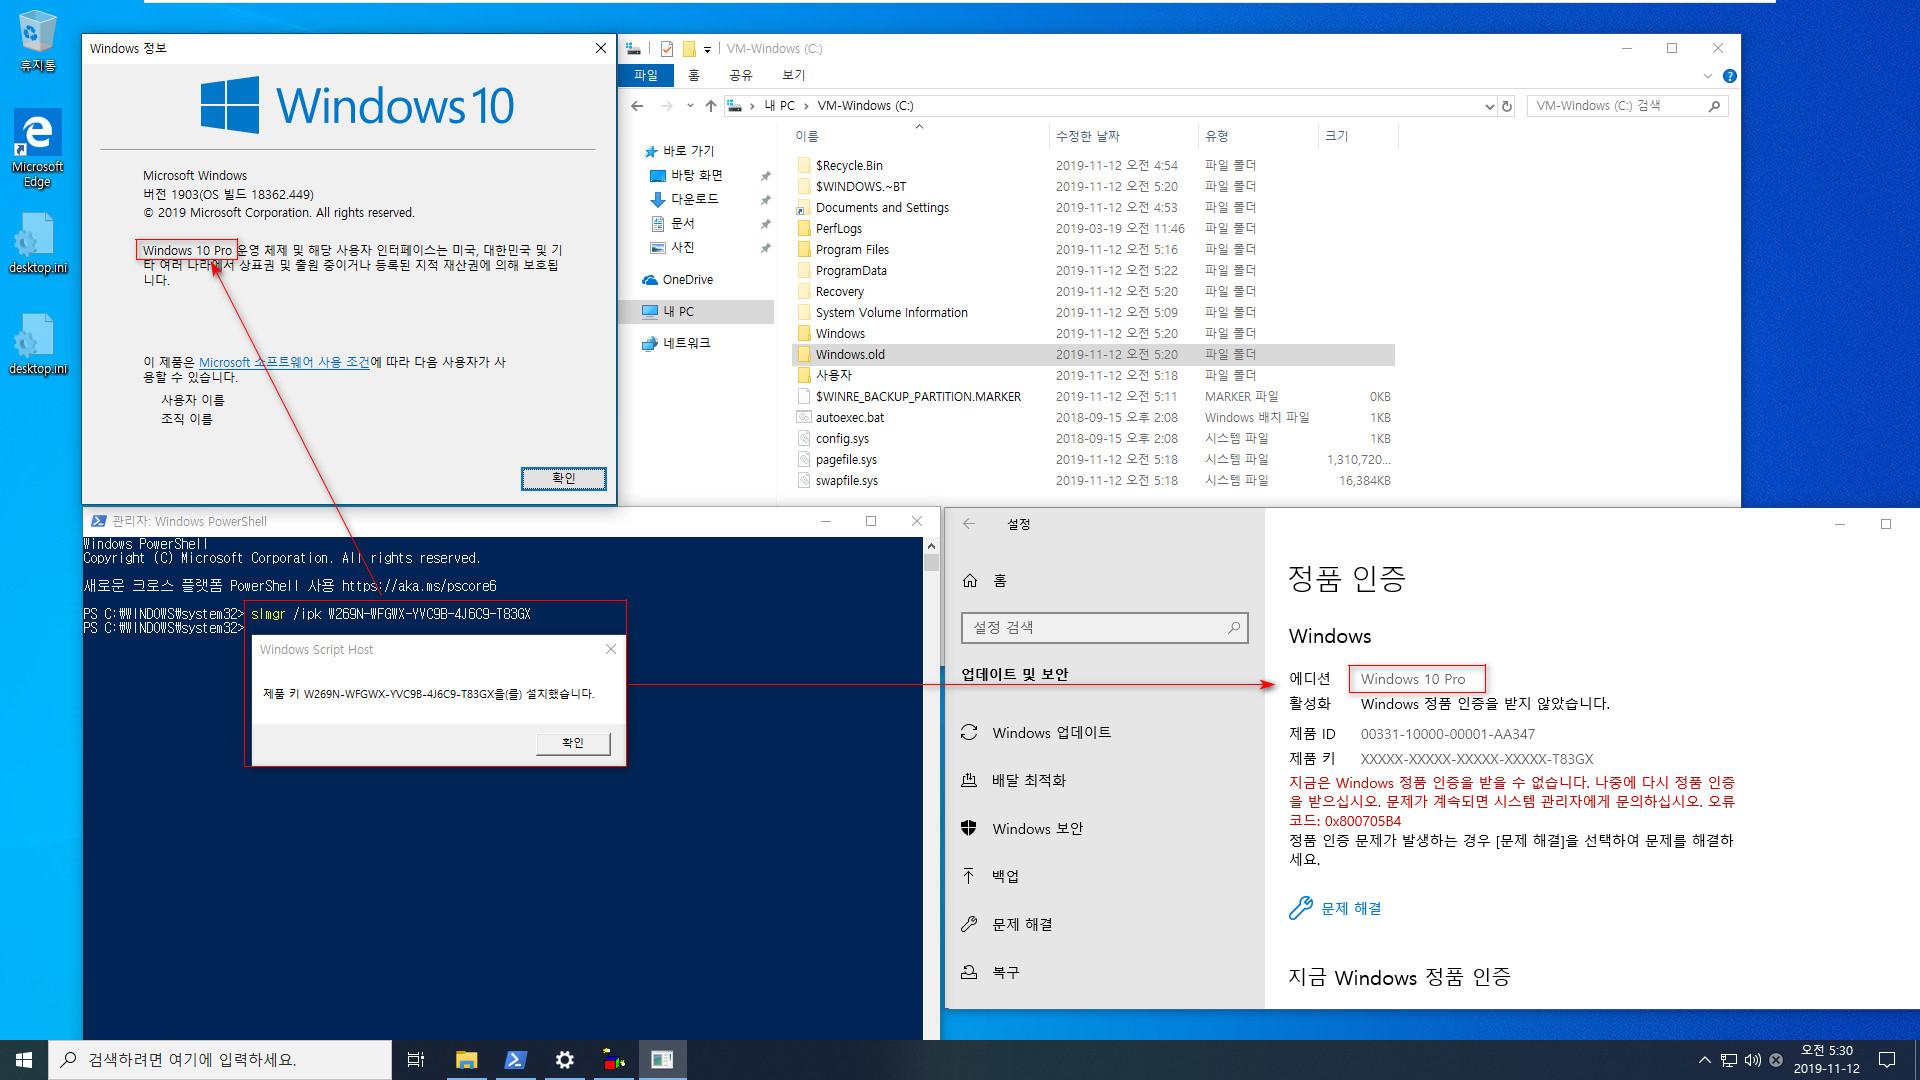 Windows 10 Enterprise LTSC [2019] (버전 1809) 를 버전 1903 프로로 업그레이드 설치하기 - 우선 설정과 앱 유지를 위해서 버전 1903 Enterprise로 업그레이드 한 후에 버전 1903 Pro로 변경하면 됩니다 2019-11-12_053005.jpg